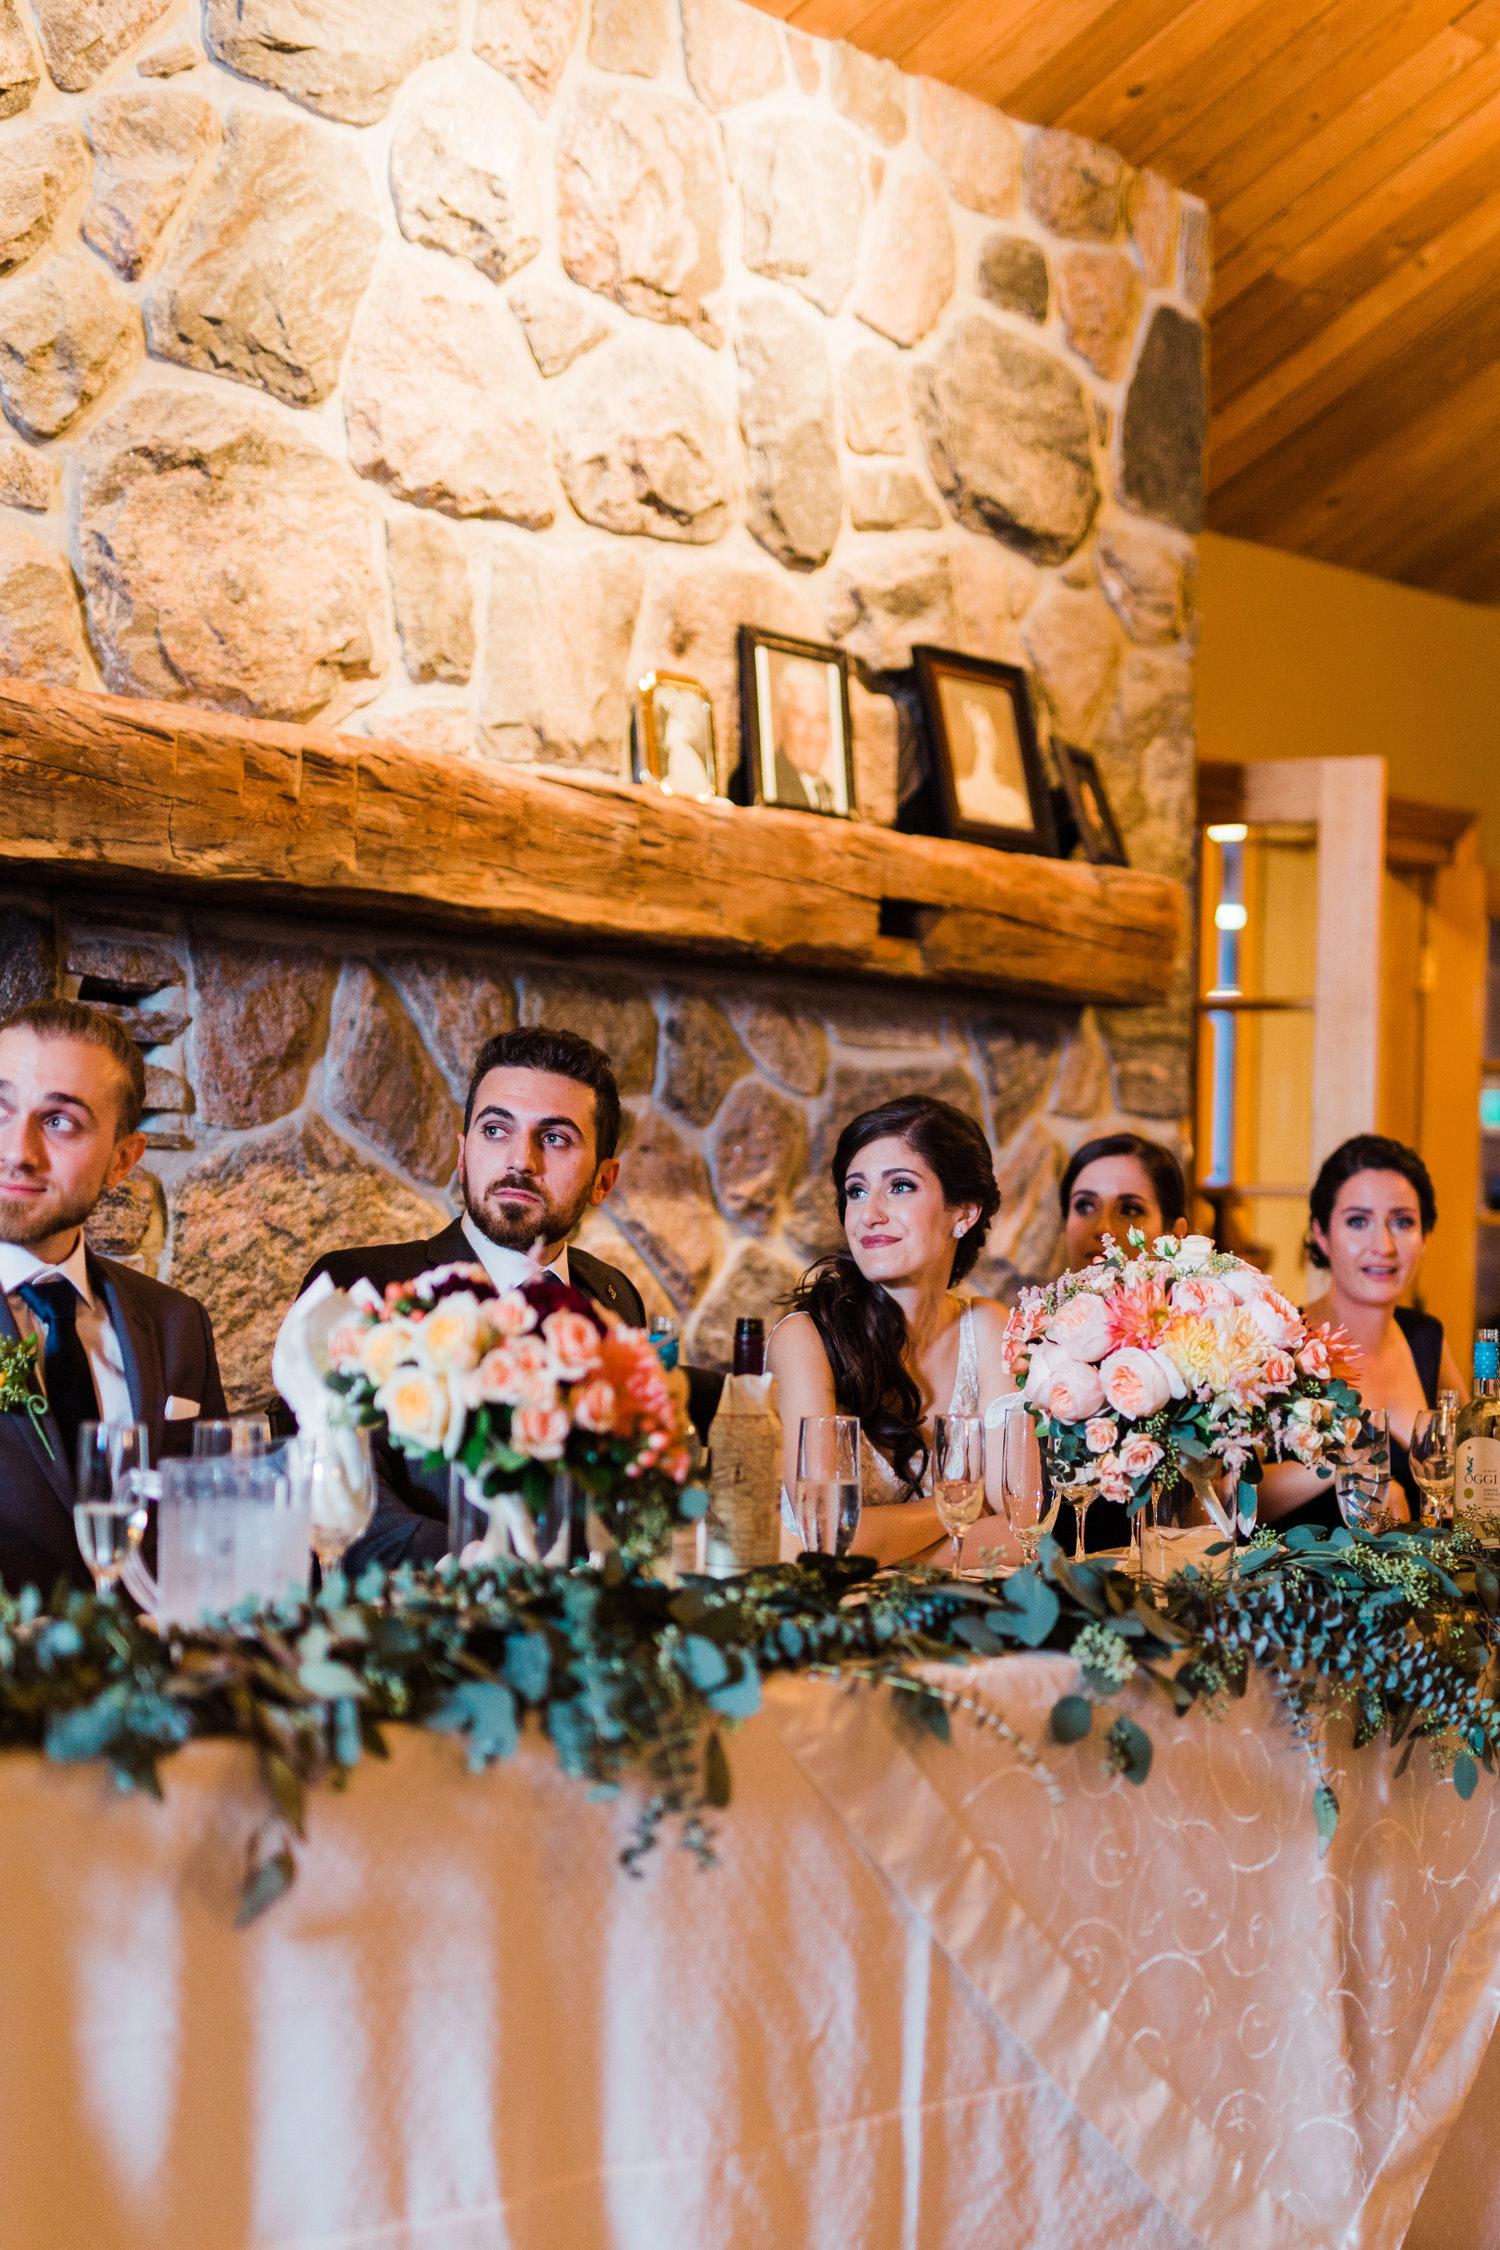 Amir-Golbazi-Danielle-Giroux-Photography_Toronto-Wedding_Cedarwood_Rachel-Paul_640.jpg